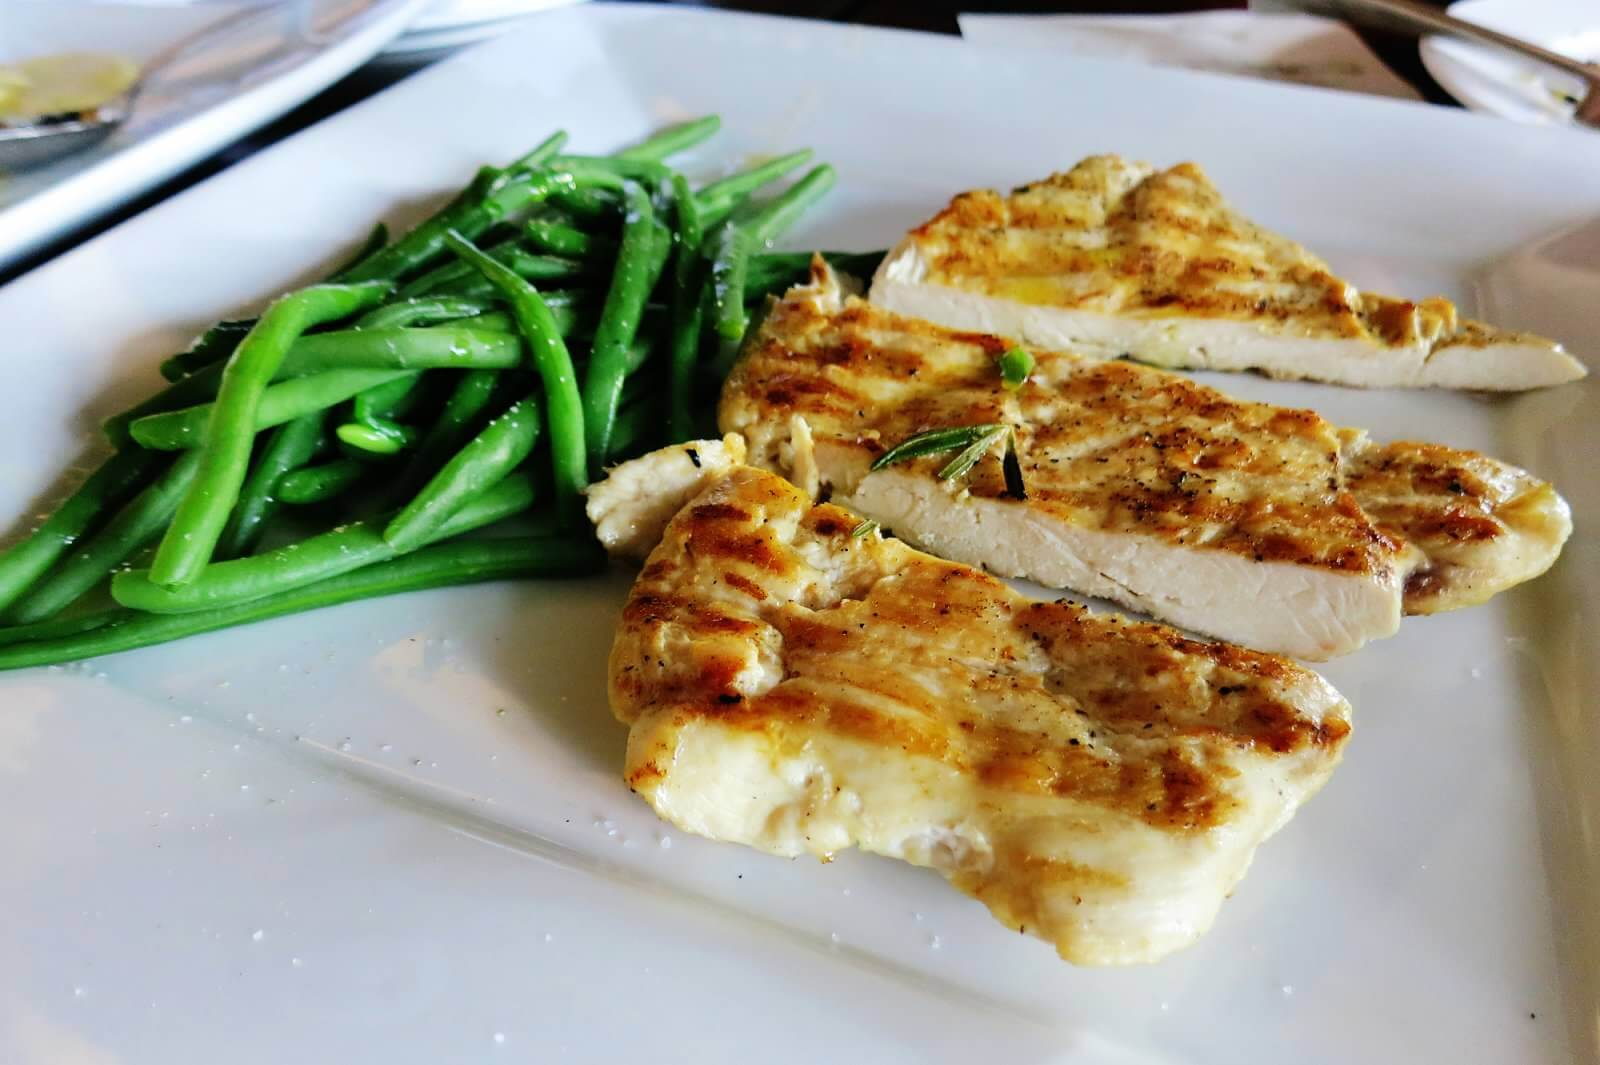 Battuta Florentina (grilled Jidori Chicken breast) and grilled vegetables.